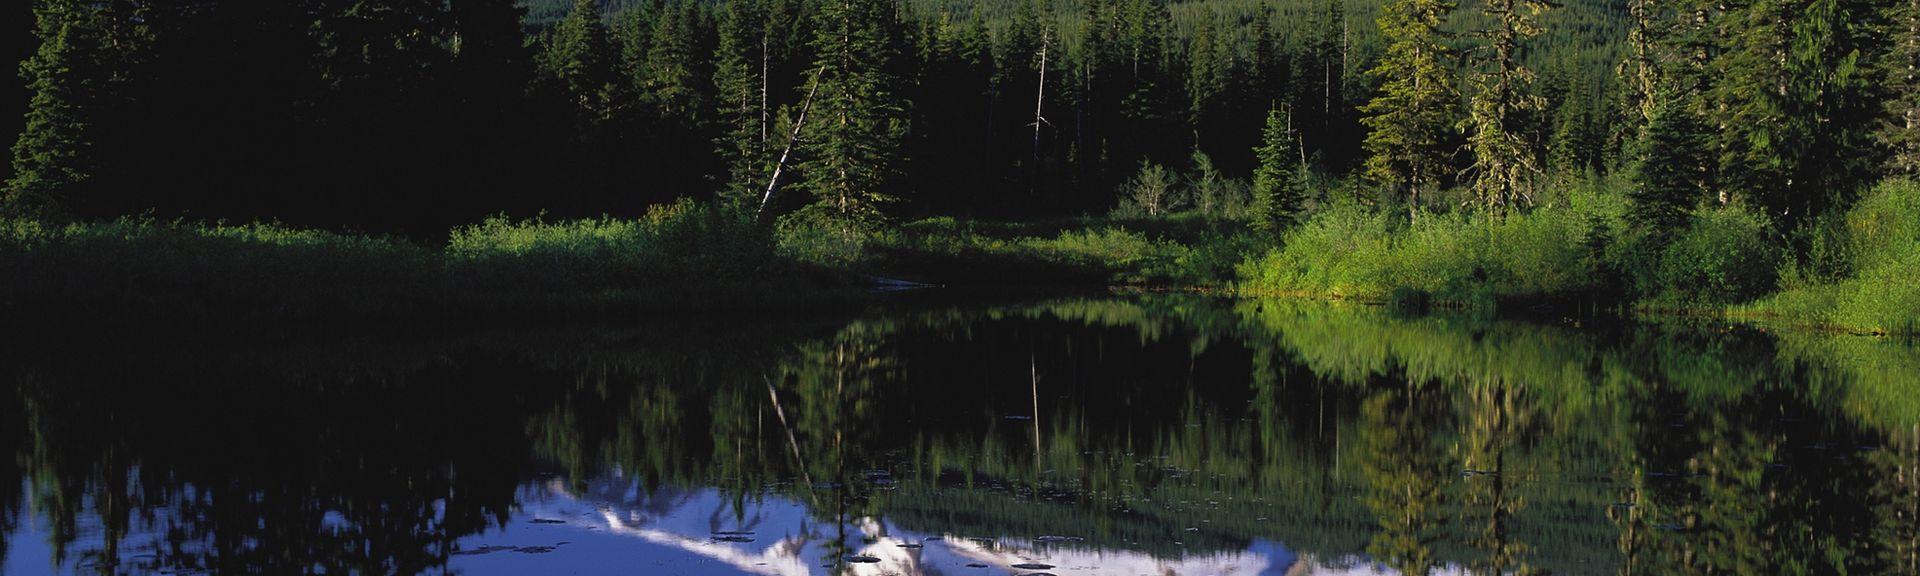 Mount Tabor, Portland, Oregon, United States of America